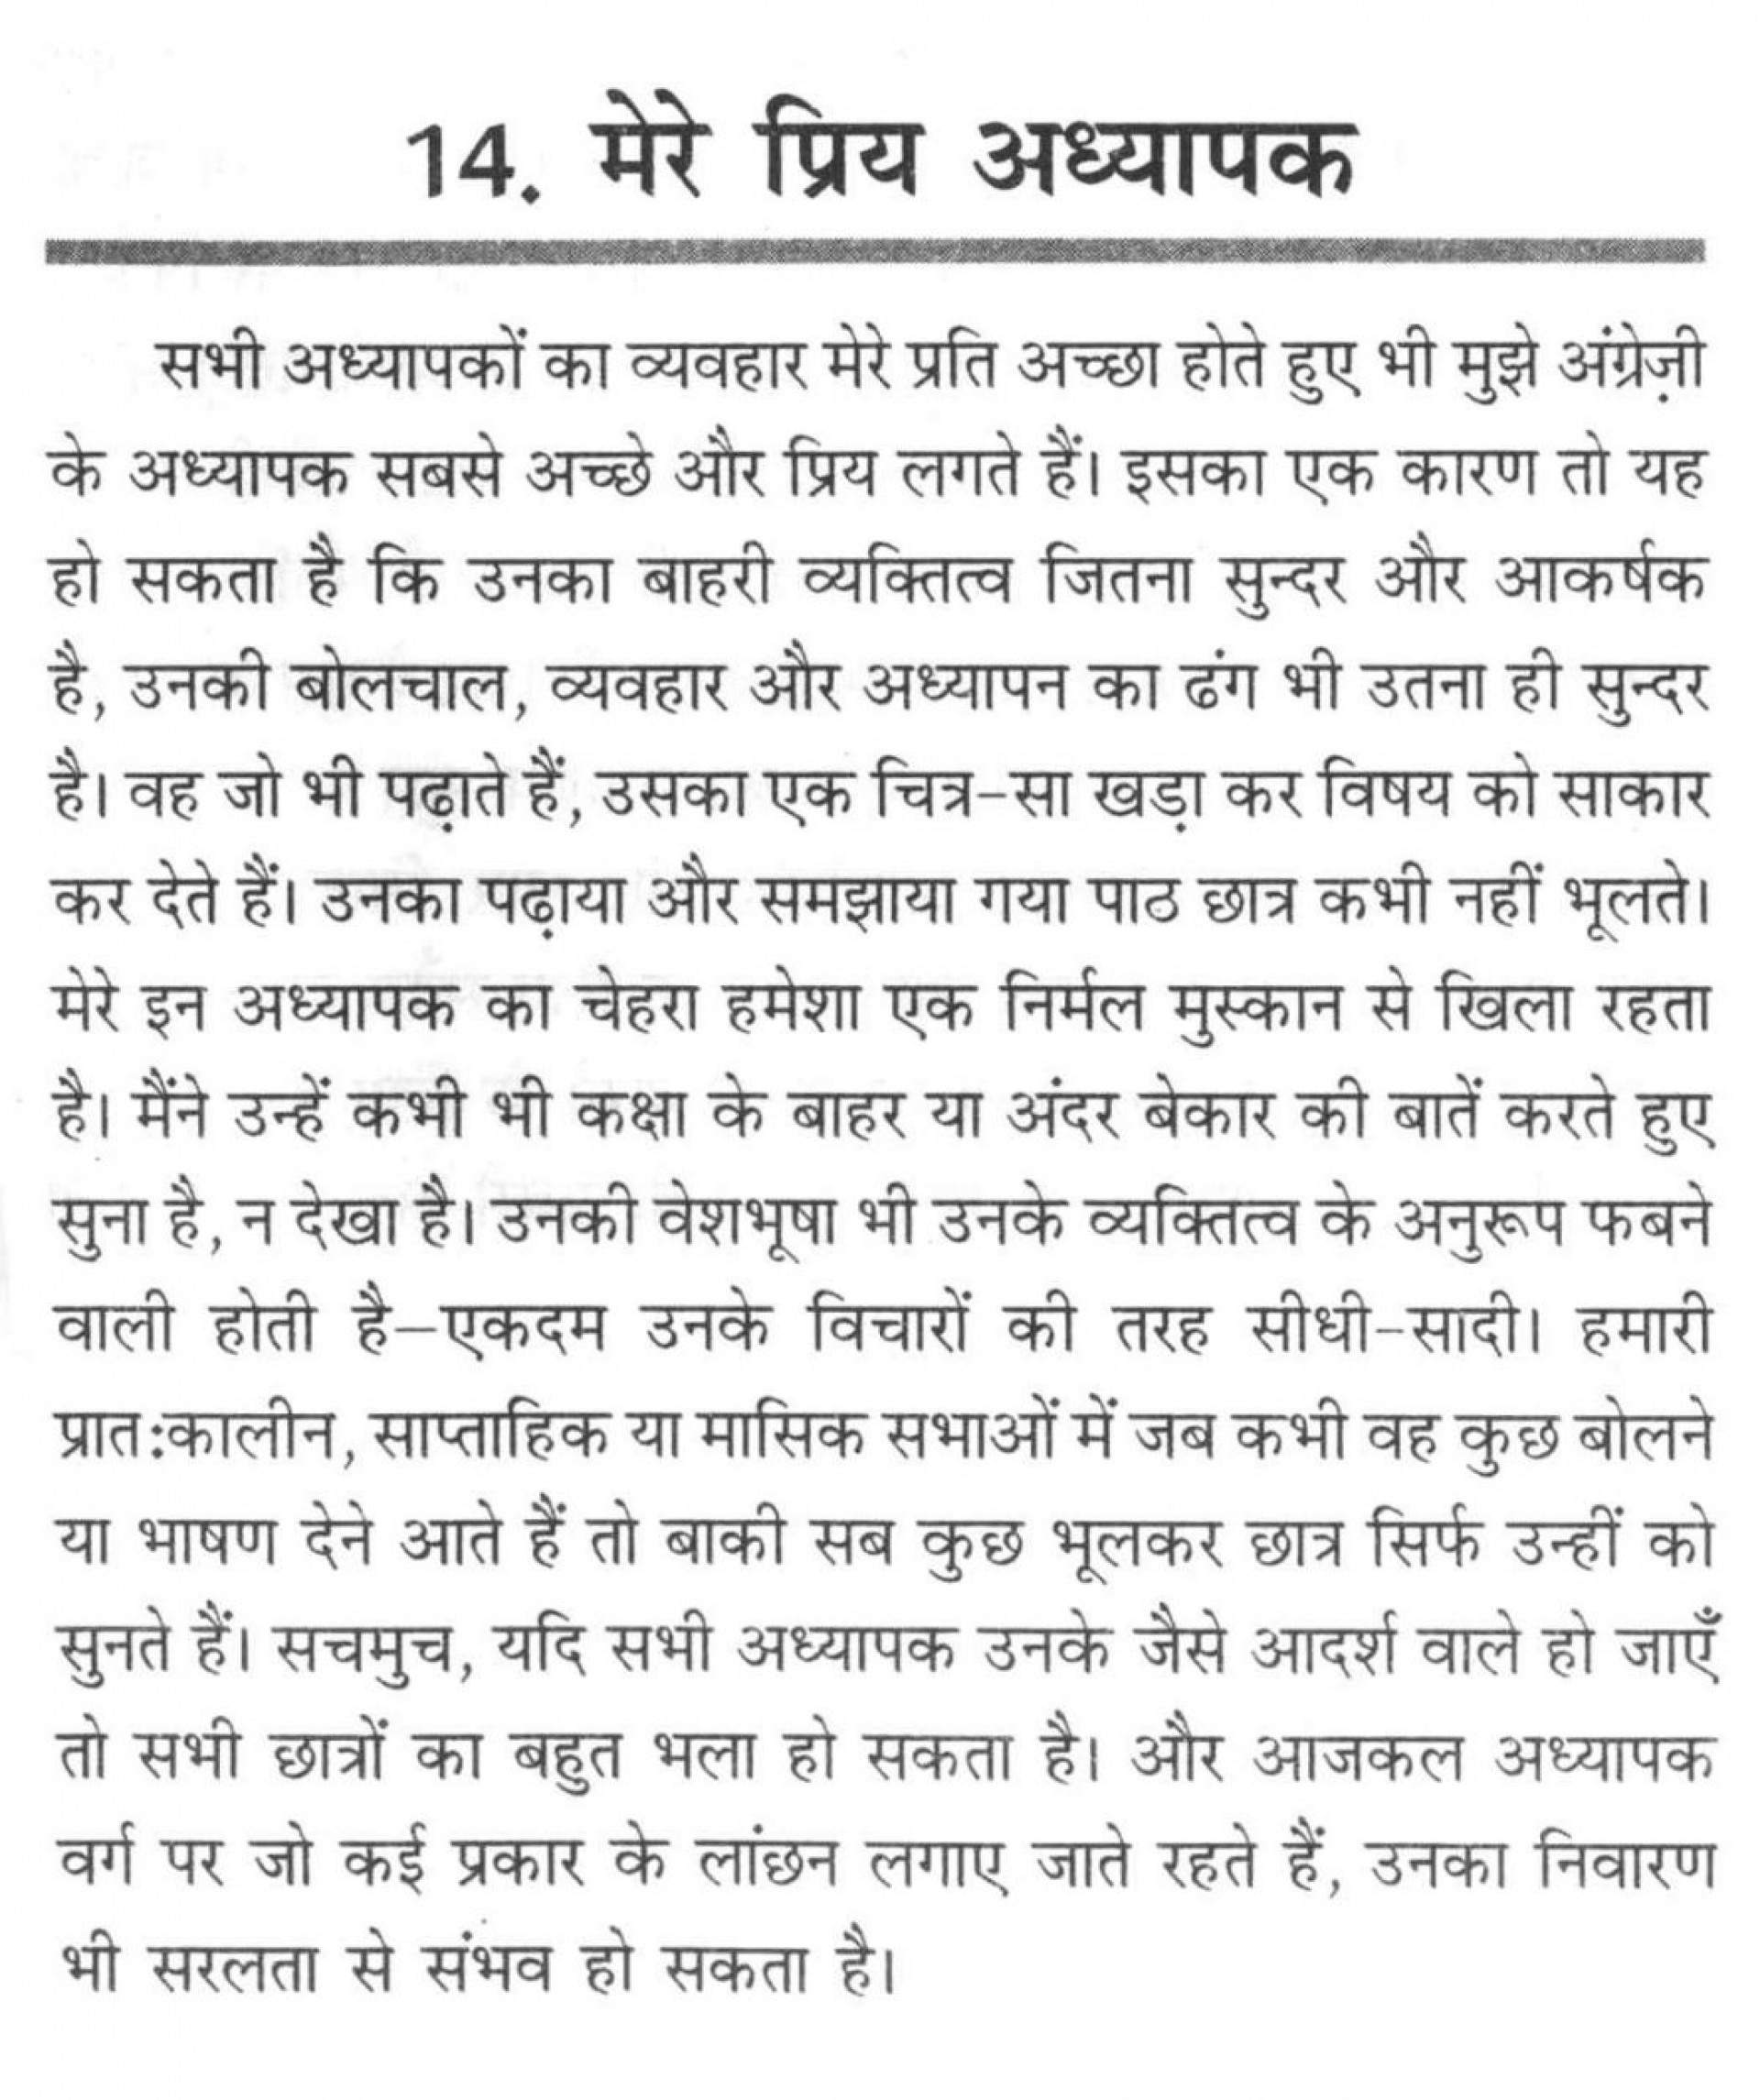 007 Qualities Of Good Friend Essay Buying Student Pdf In Telugu Punjabi Successful English Traits Leader Words Hindi Urdu 1048x1251 Exceptional A Short 1920